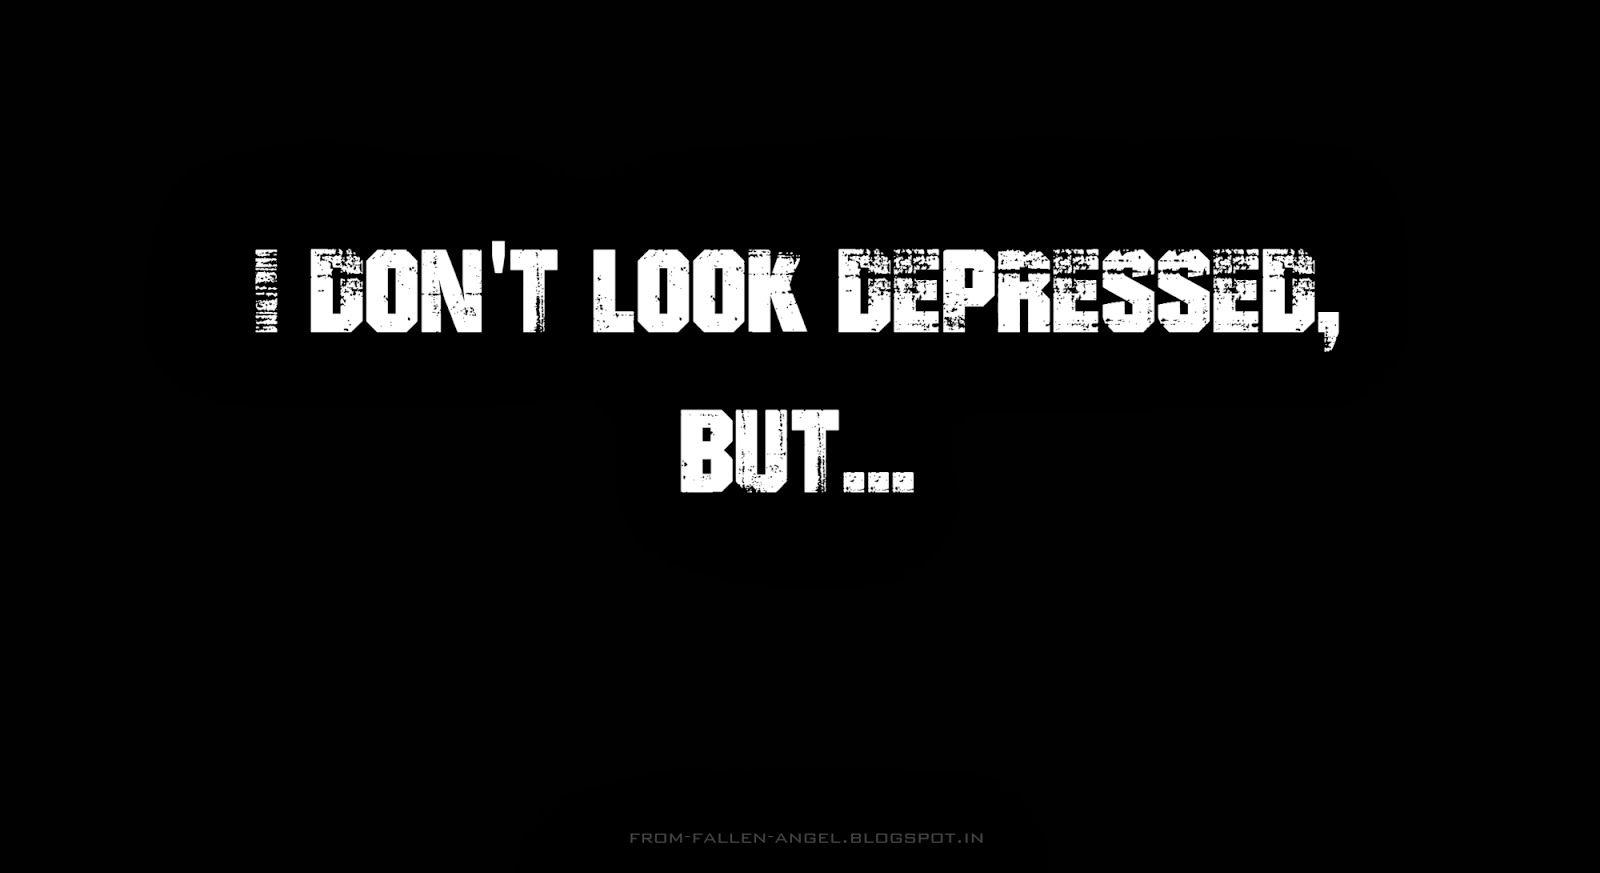 Fallen Angel: I don't look depressed, but...